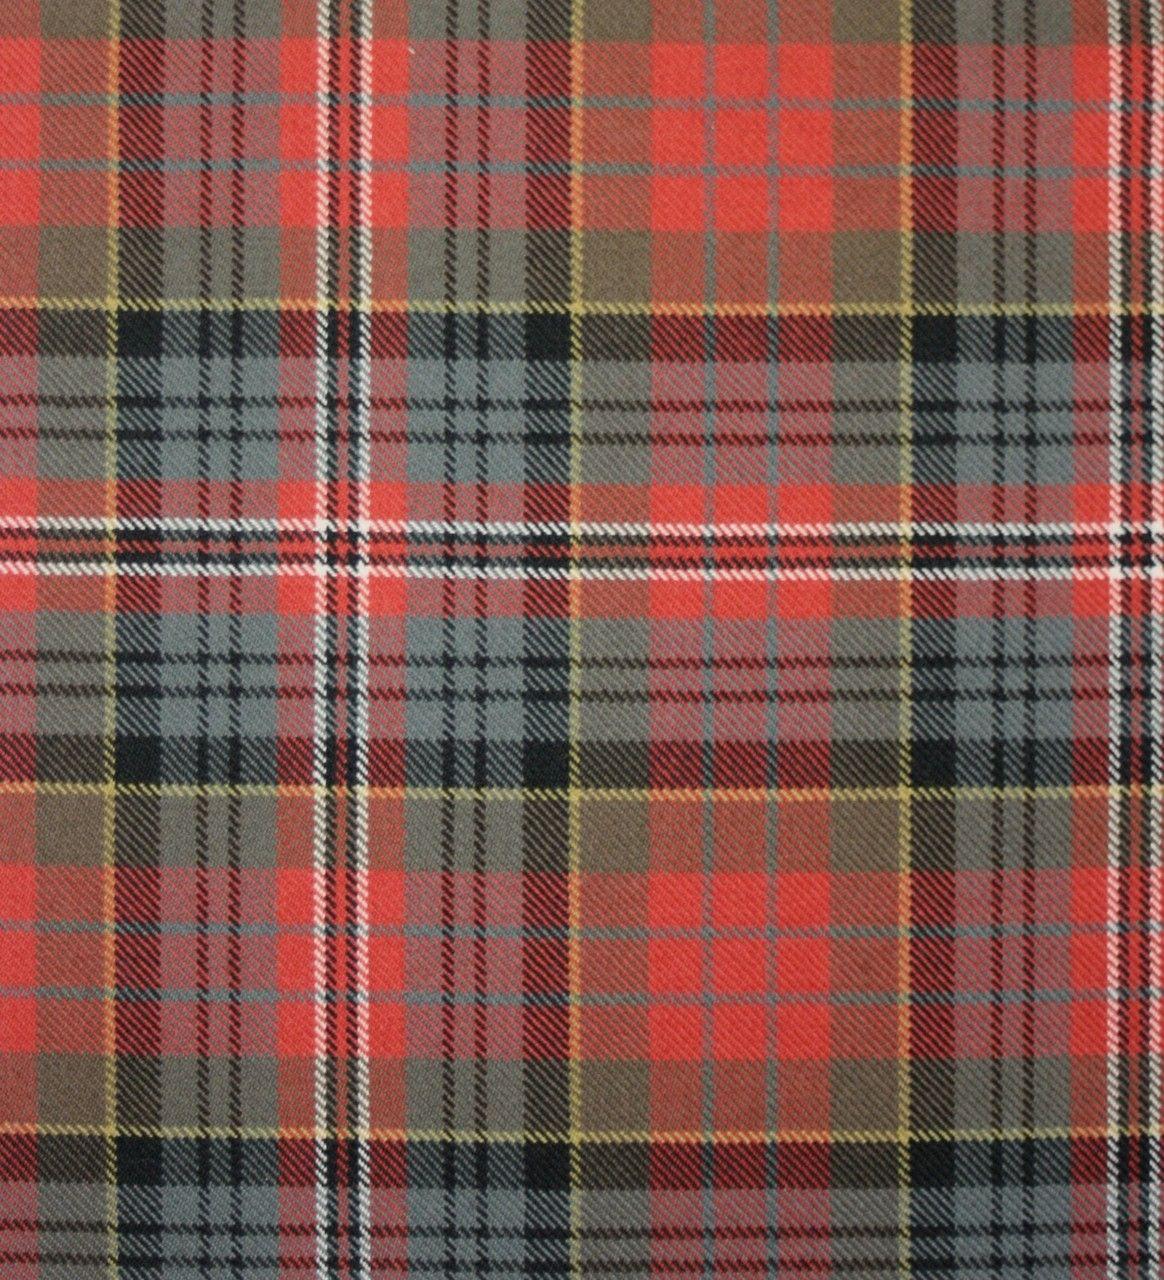 MacPherson Clan Weathered Heavy Weight Tartan Fabric | Lochcarron of Scotland